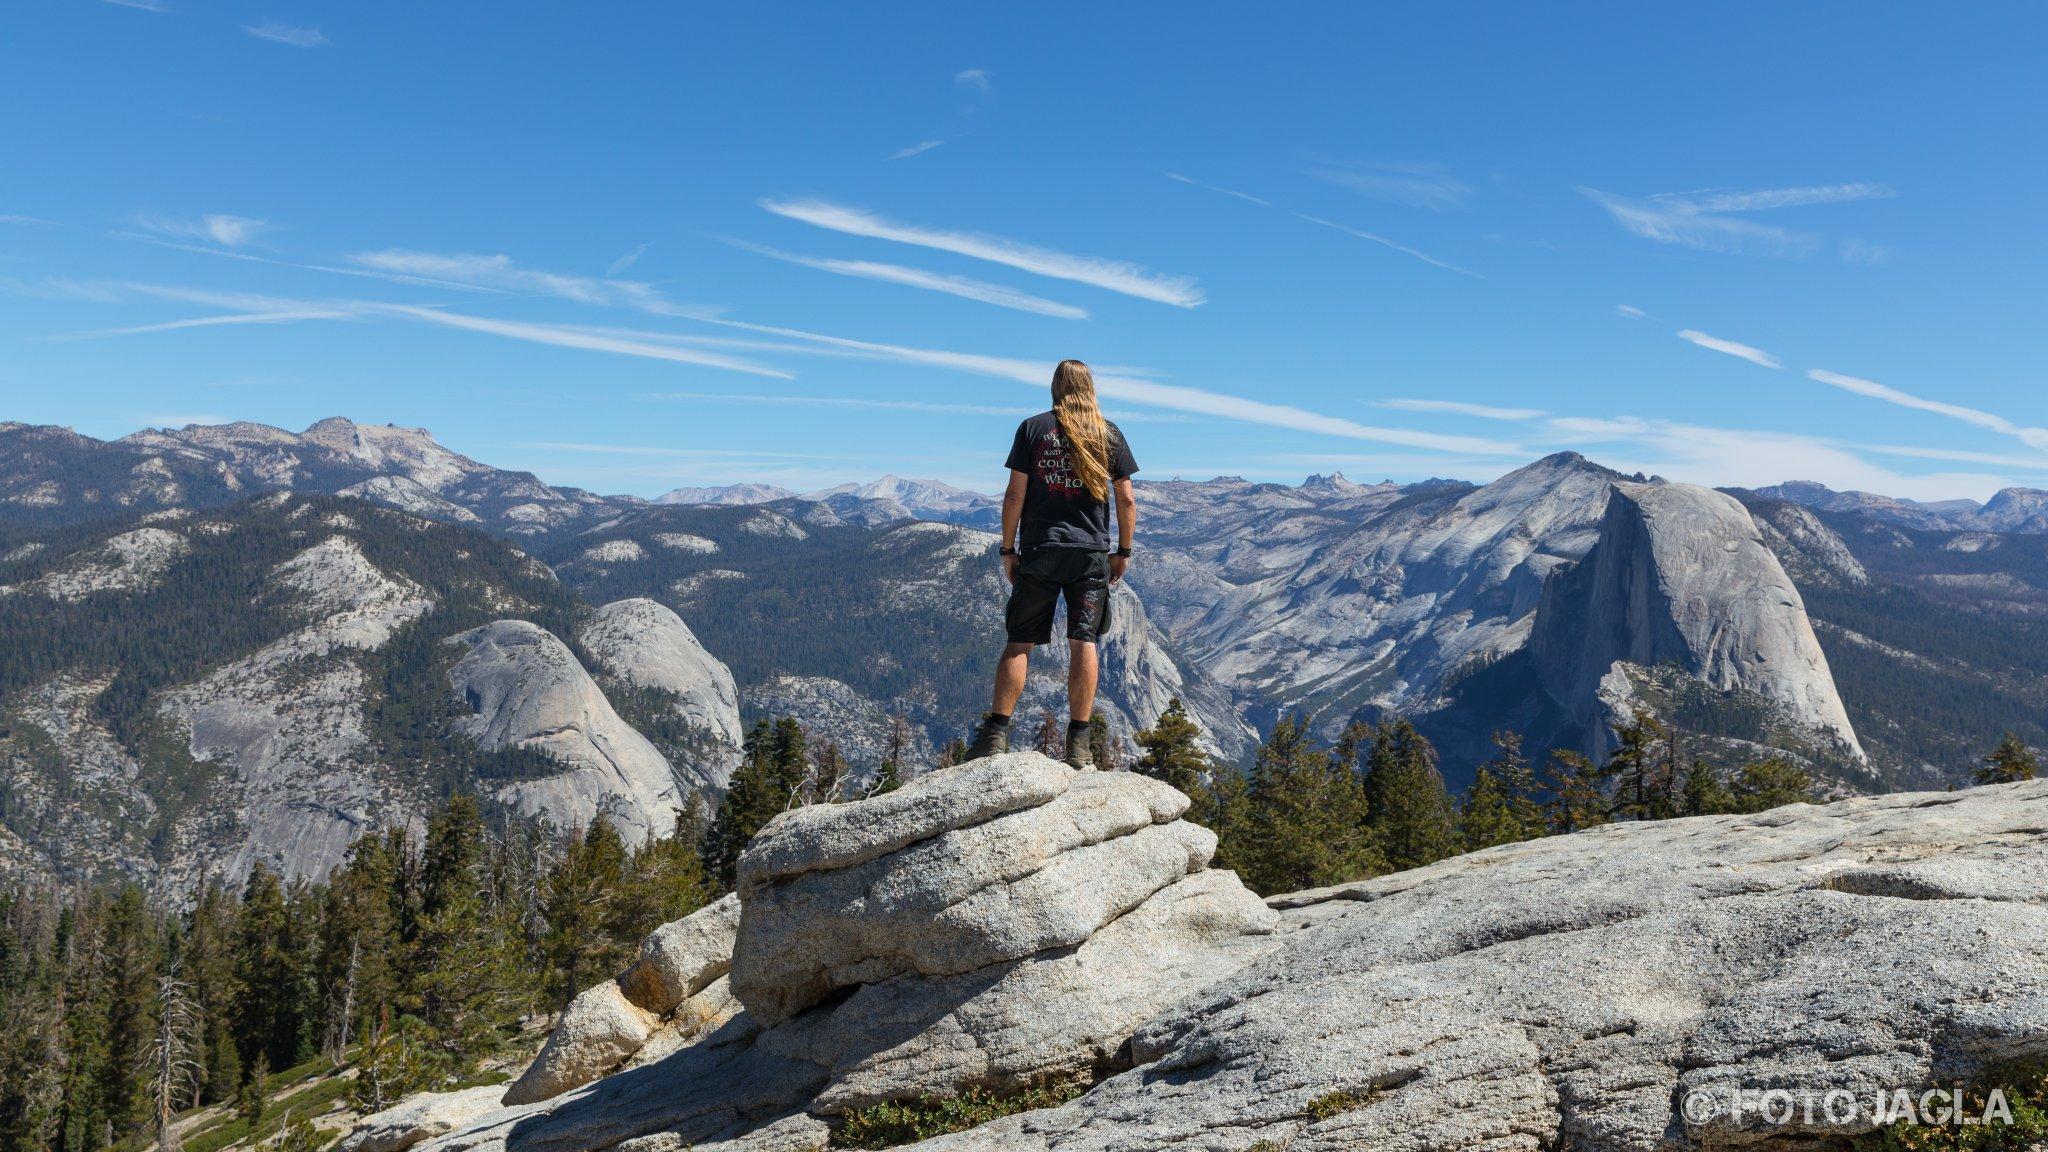 Kalifornien - September 2018 Ausblick vom Sentinel Dome Yosemite National Park - Yosemite Valley, Mariposa Country